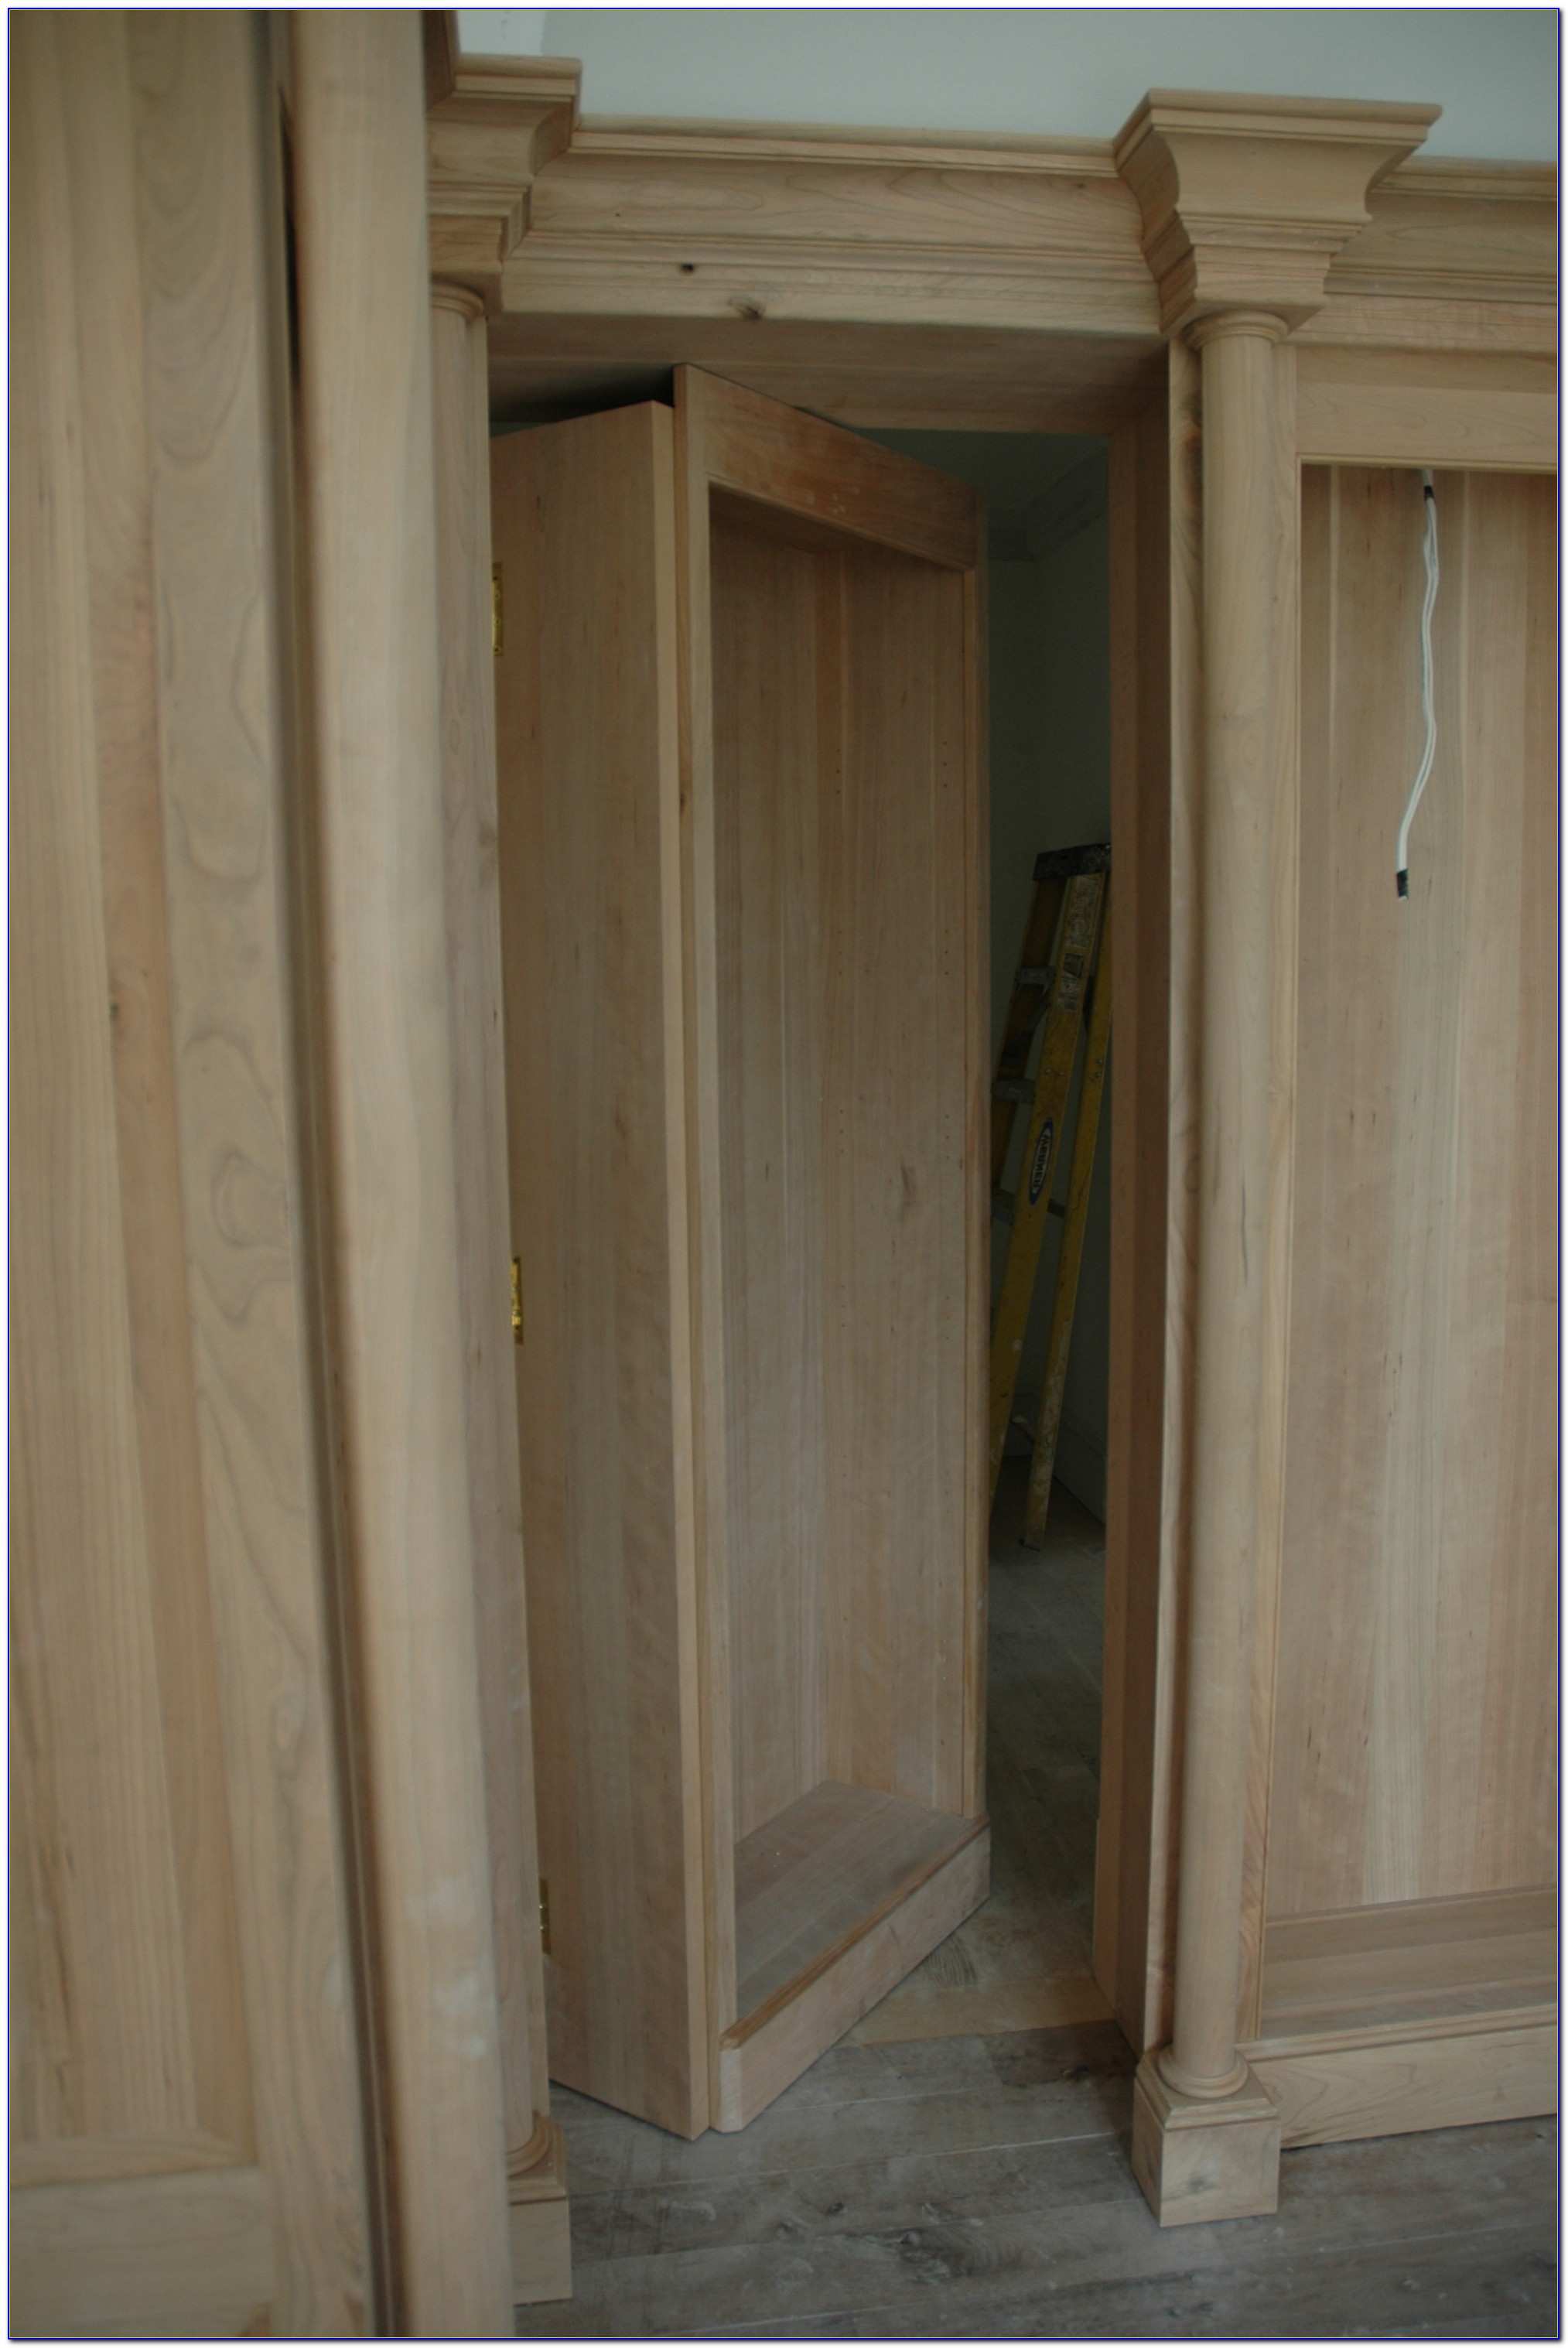 How To Make A Secret Bookshelf Door